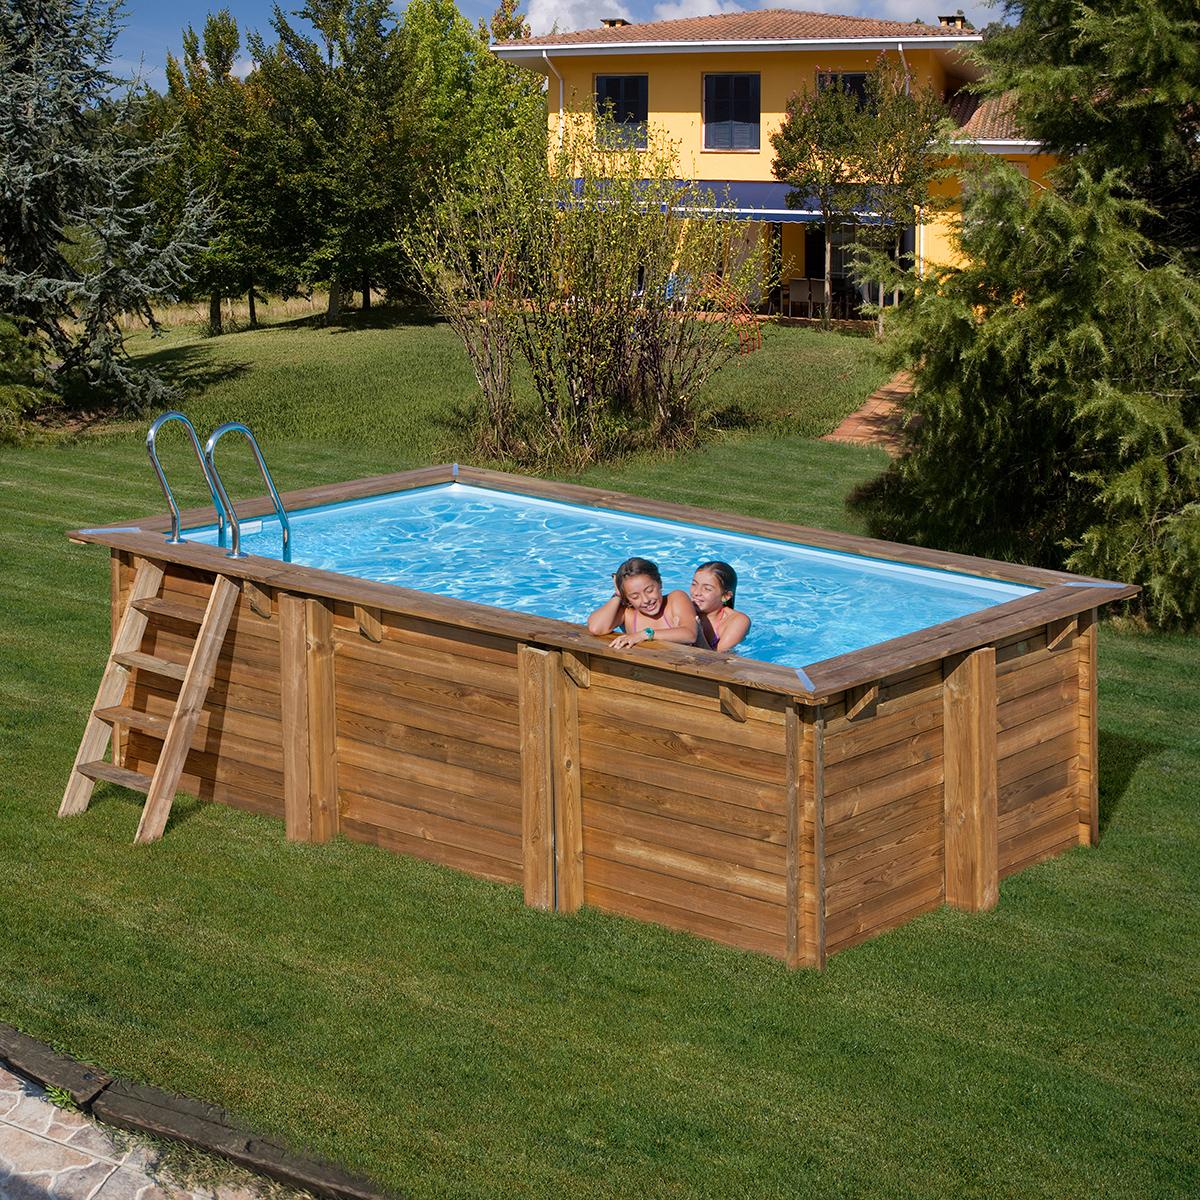 Piscina gre sunbay marbella 400x250x119 piscinas - Piscinas intex espana ...